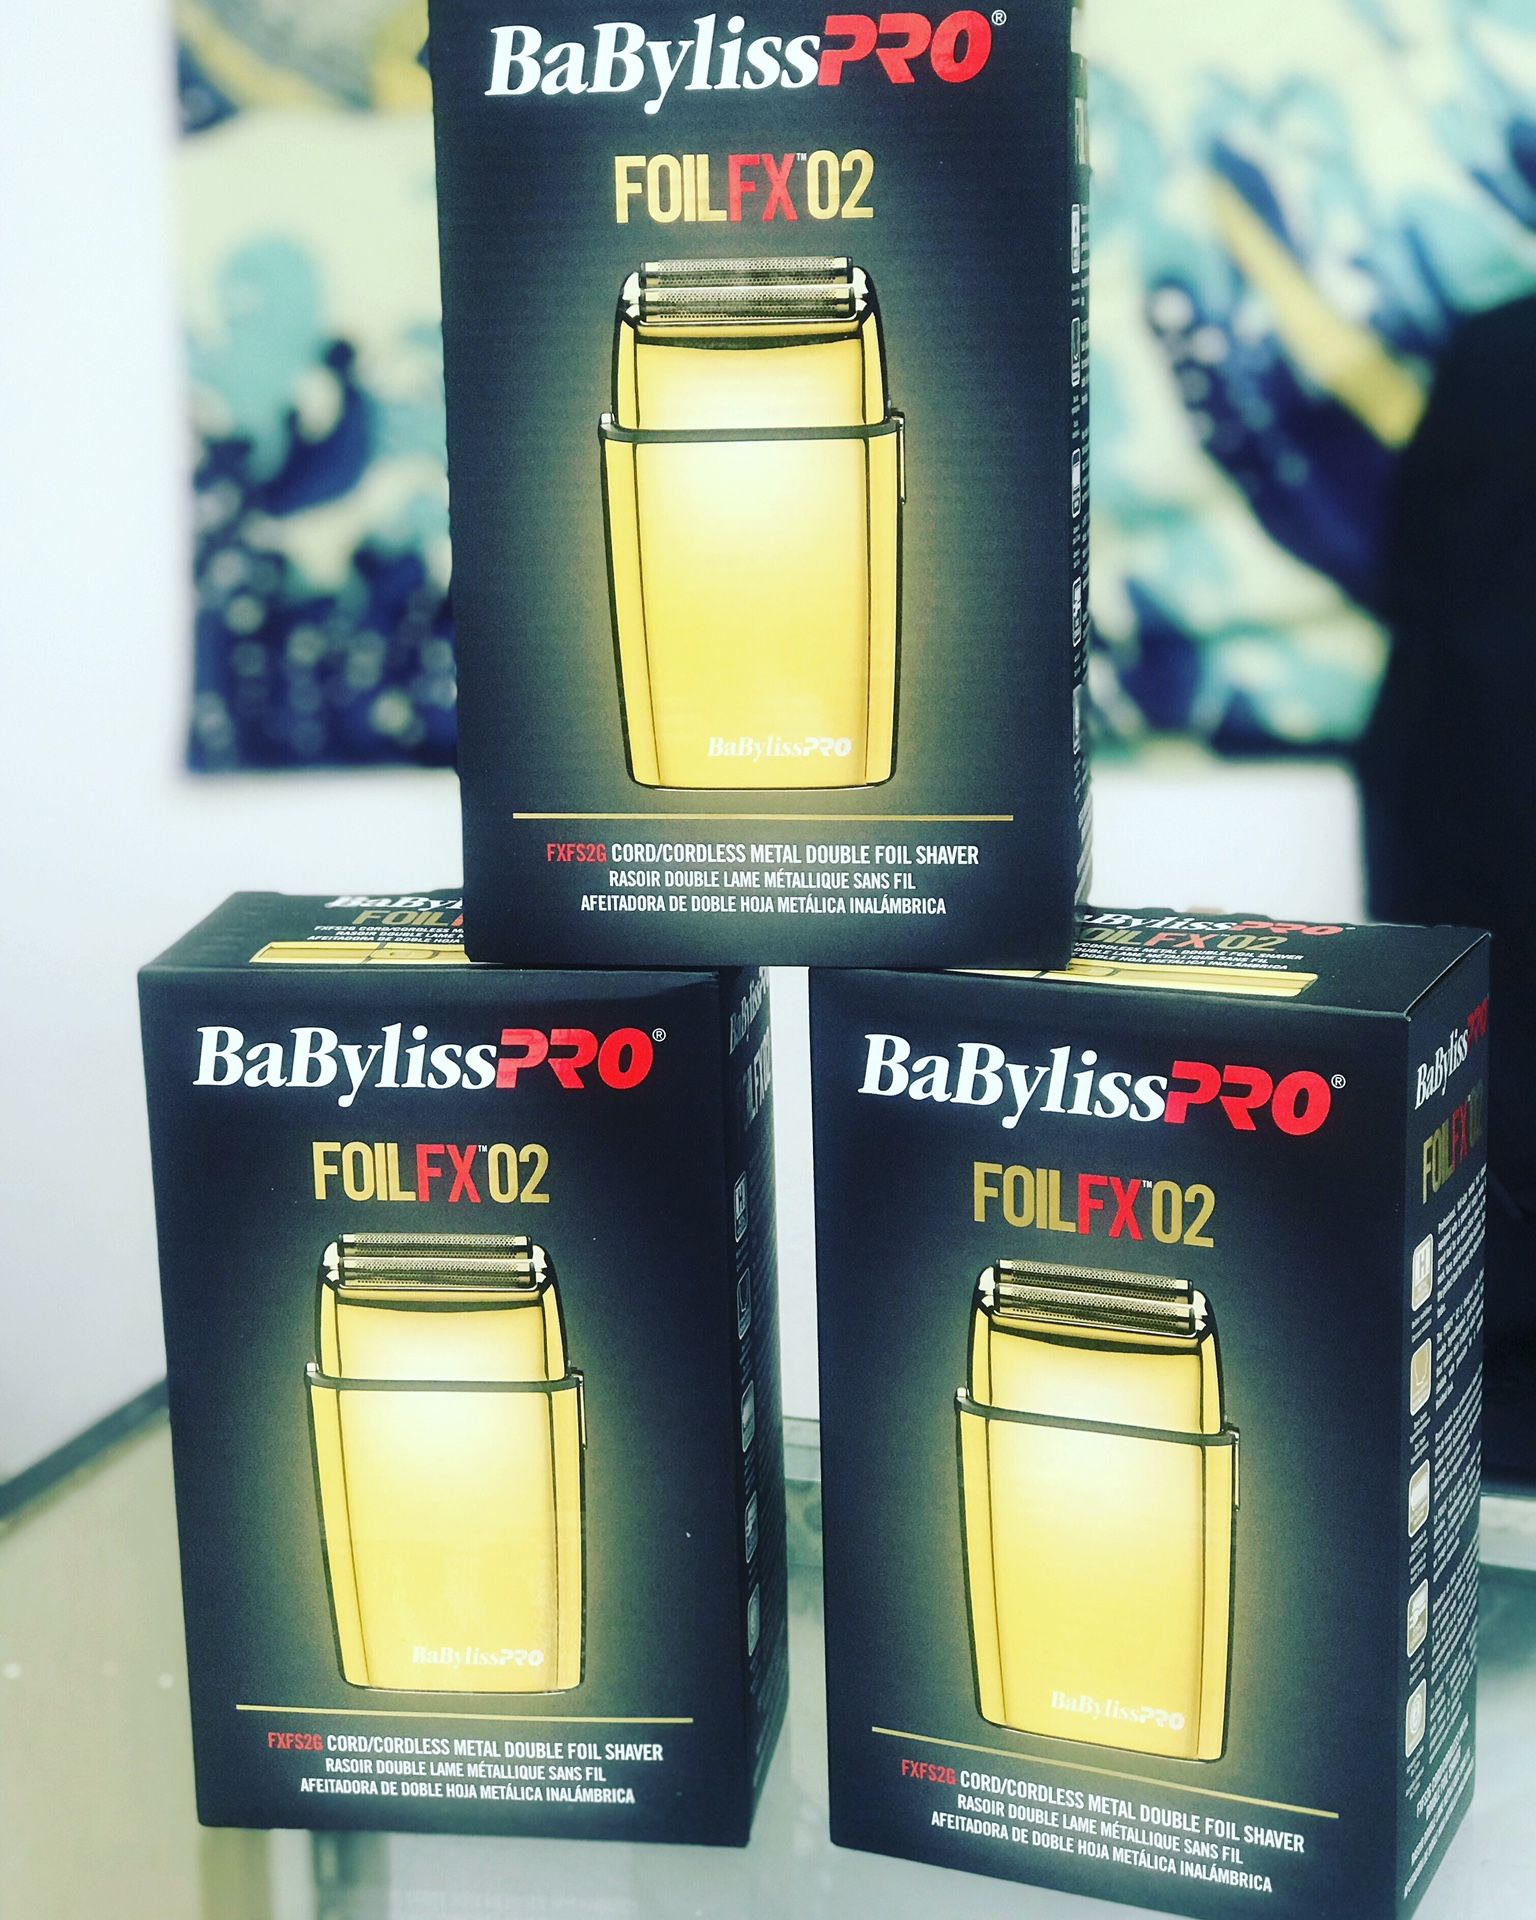 Babyliss pro foil fx02